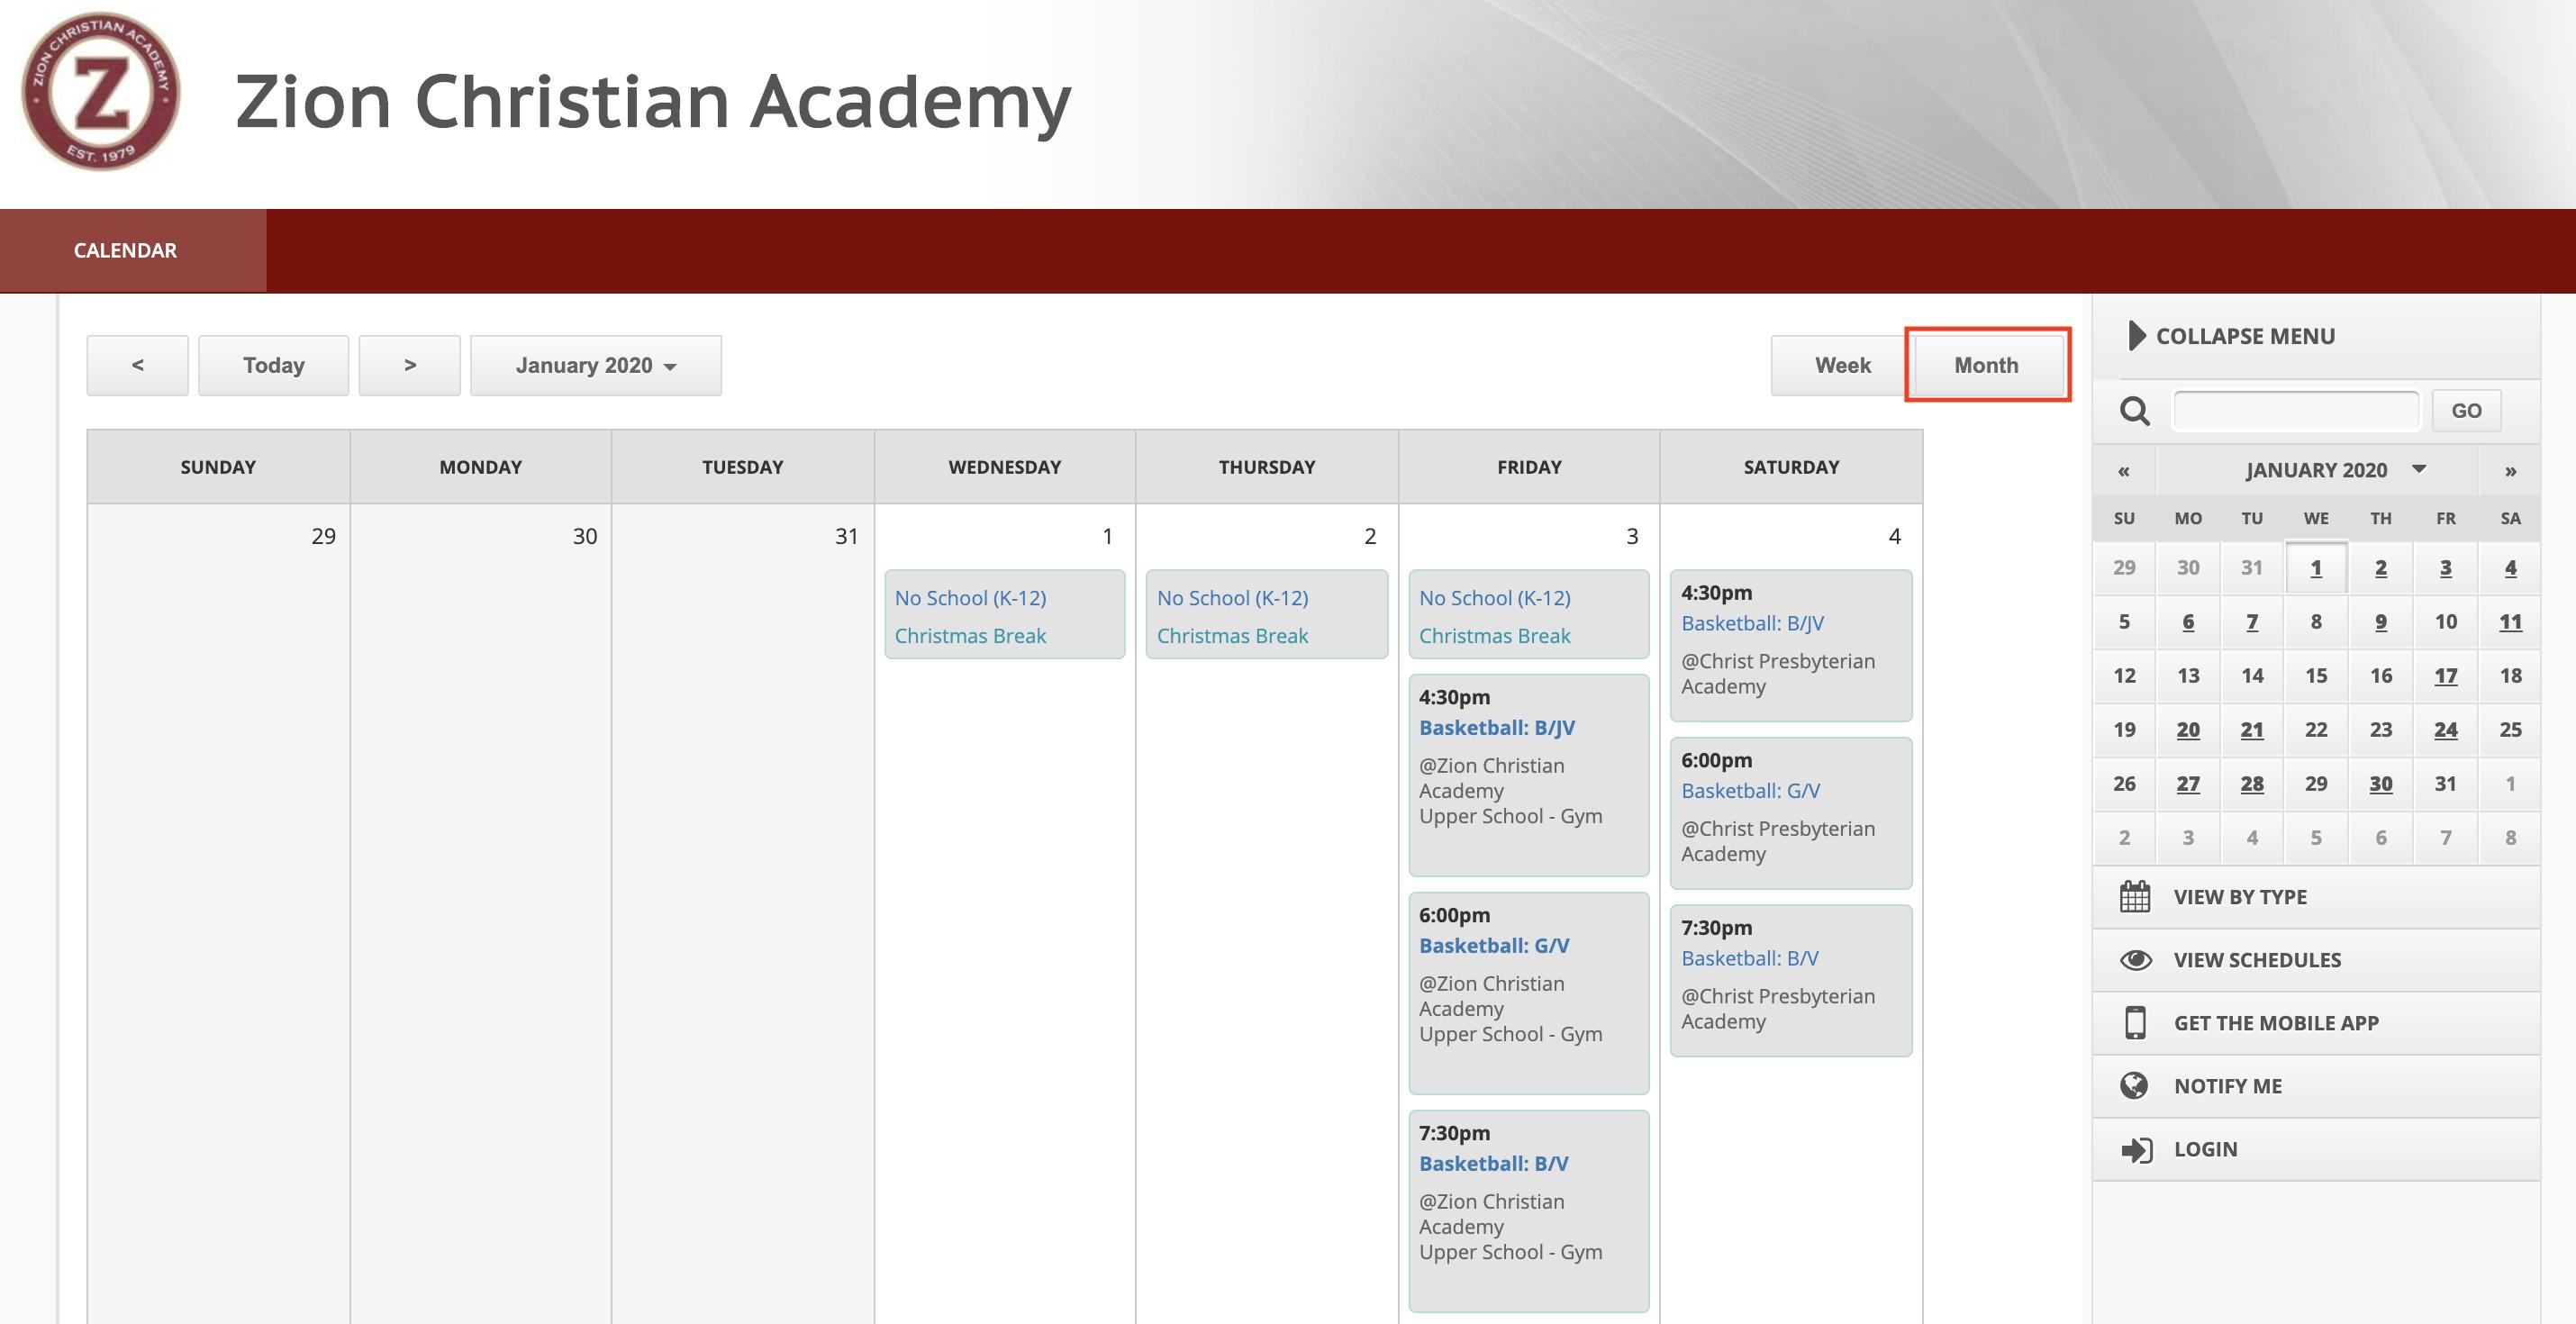 Davidson County Tn School Calendar 2021 | Printable Regarding University Of Rhode Island Academic Calendar 2021